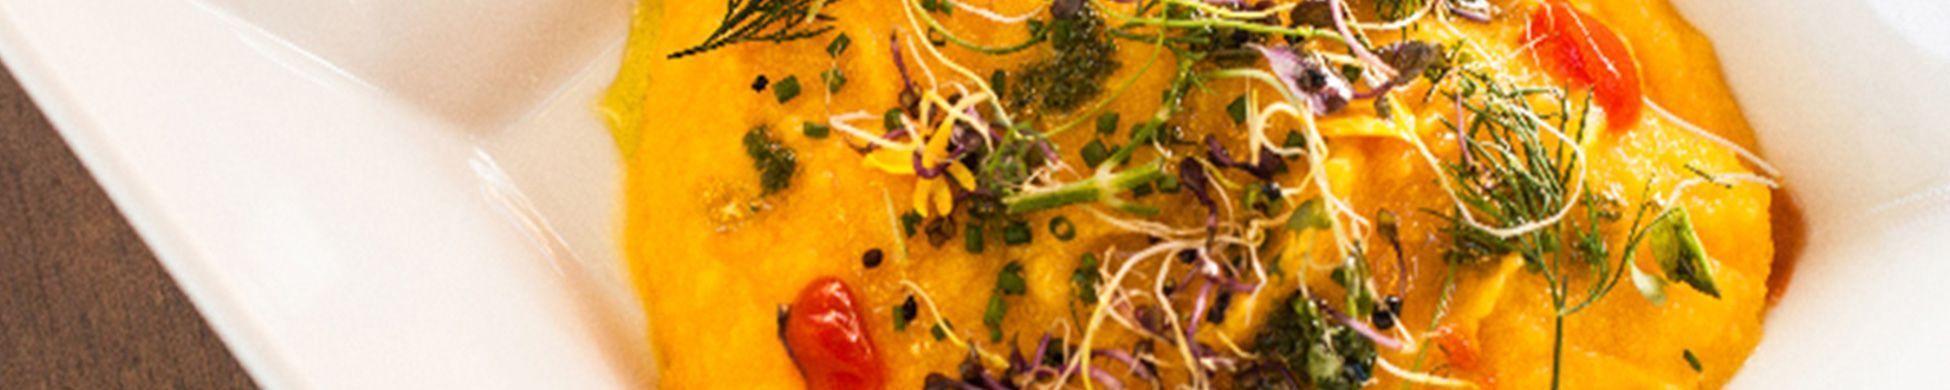 cb_ento_moianes_gastronomia